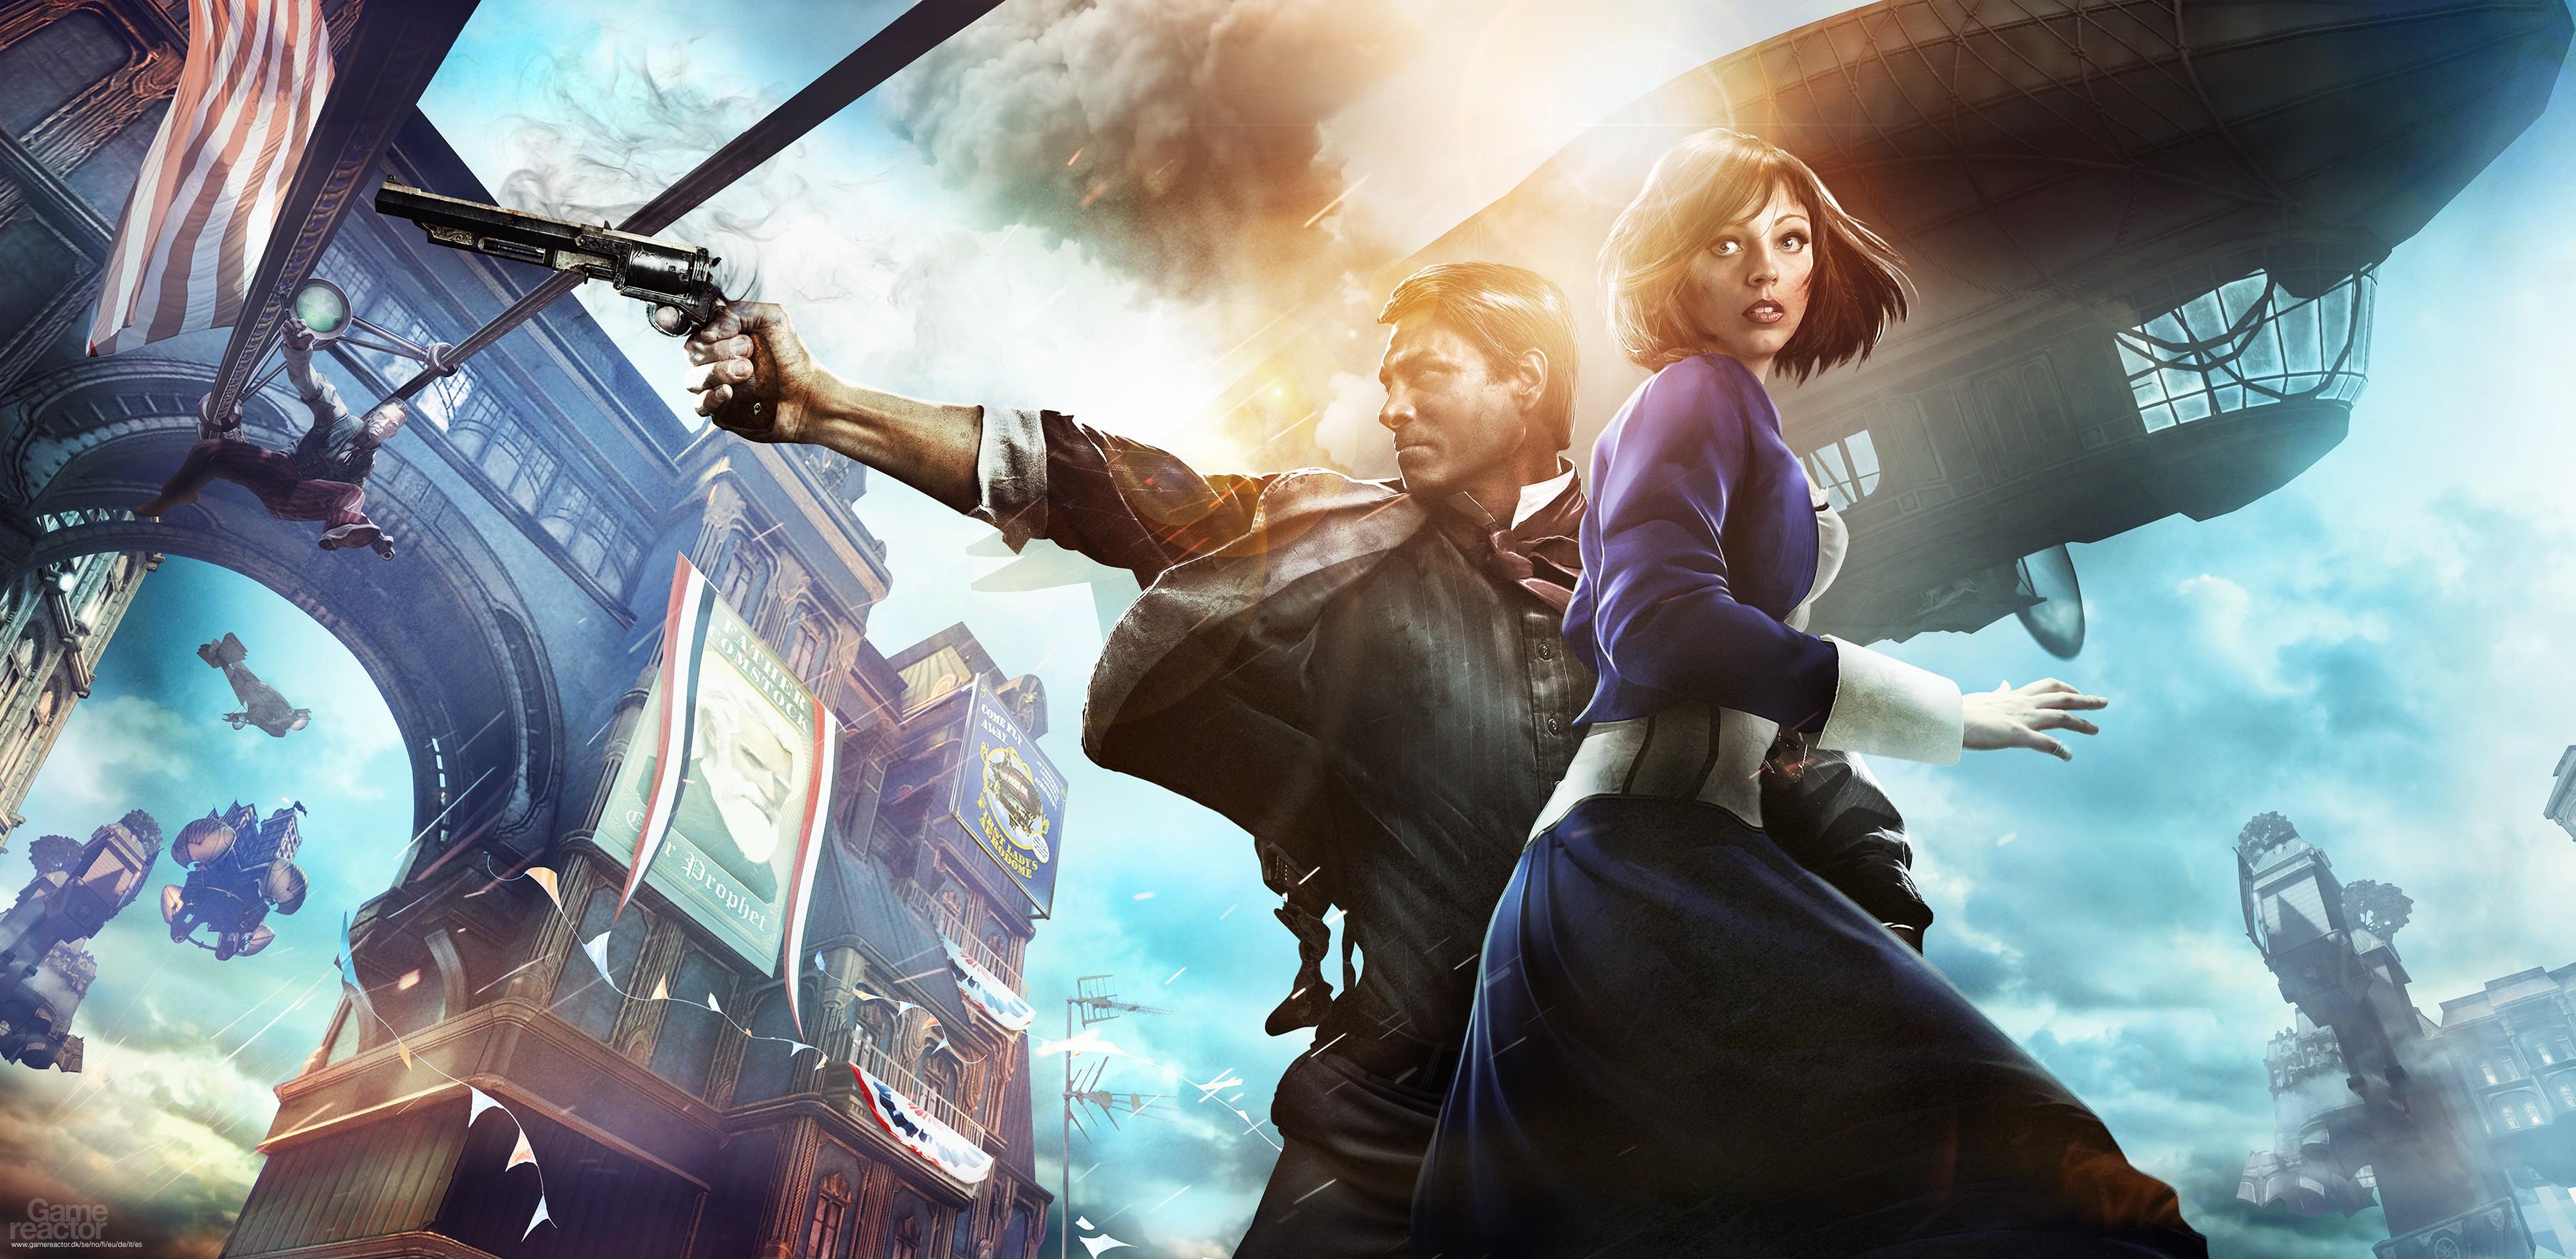 Bioshock_Infinite-Booker_DeWitt_Elizabeth_02.jpg